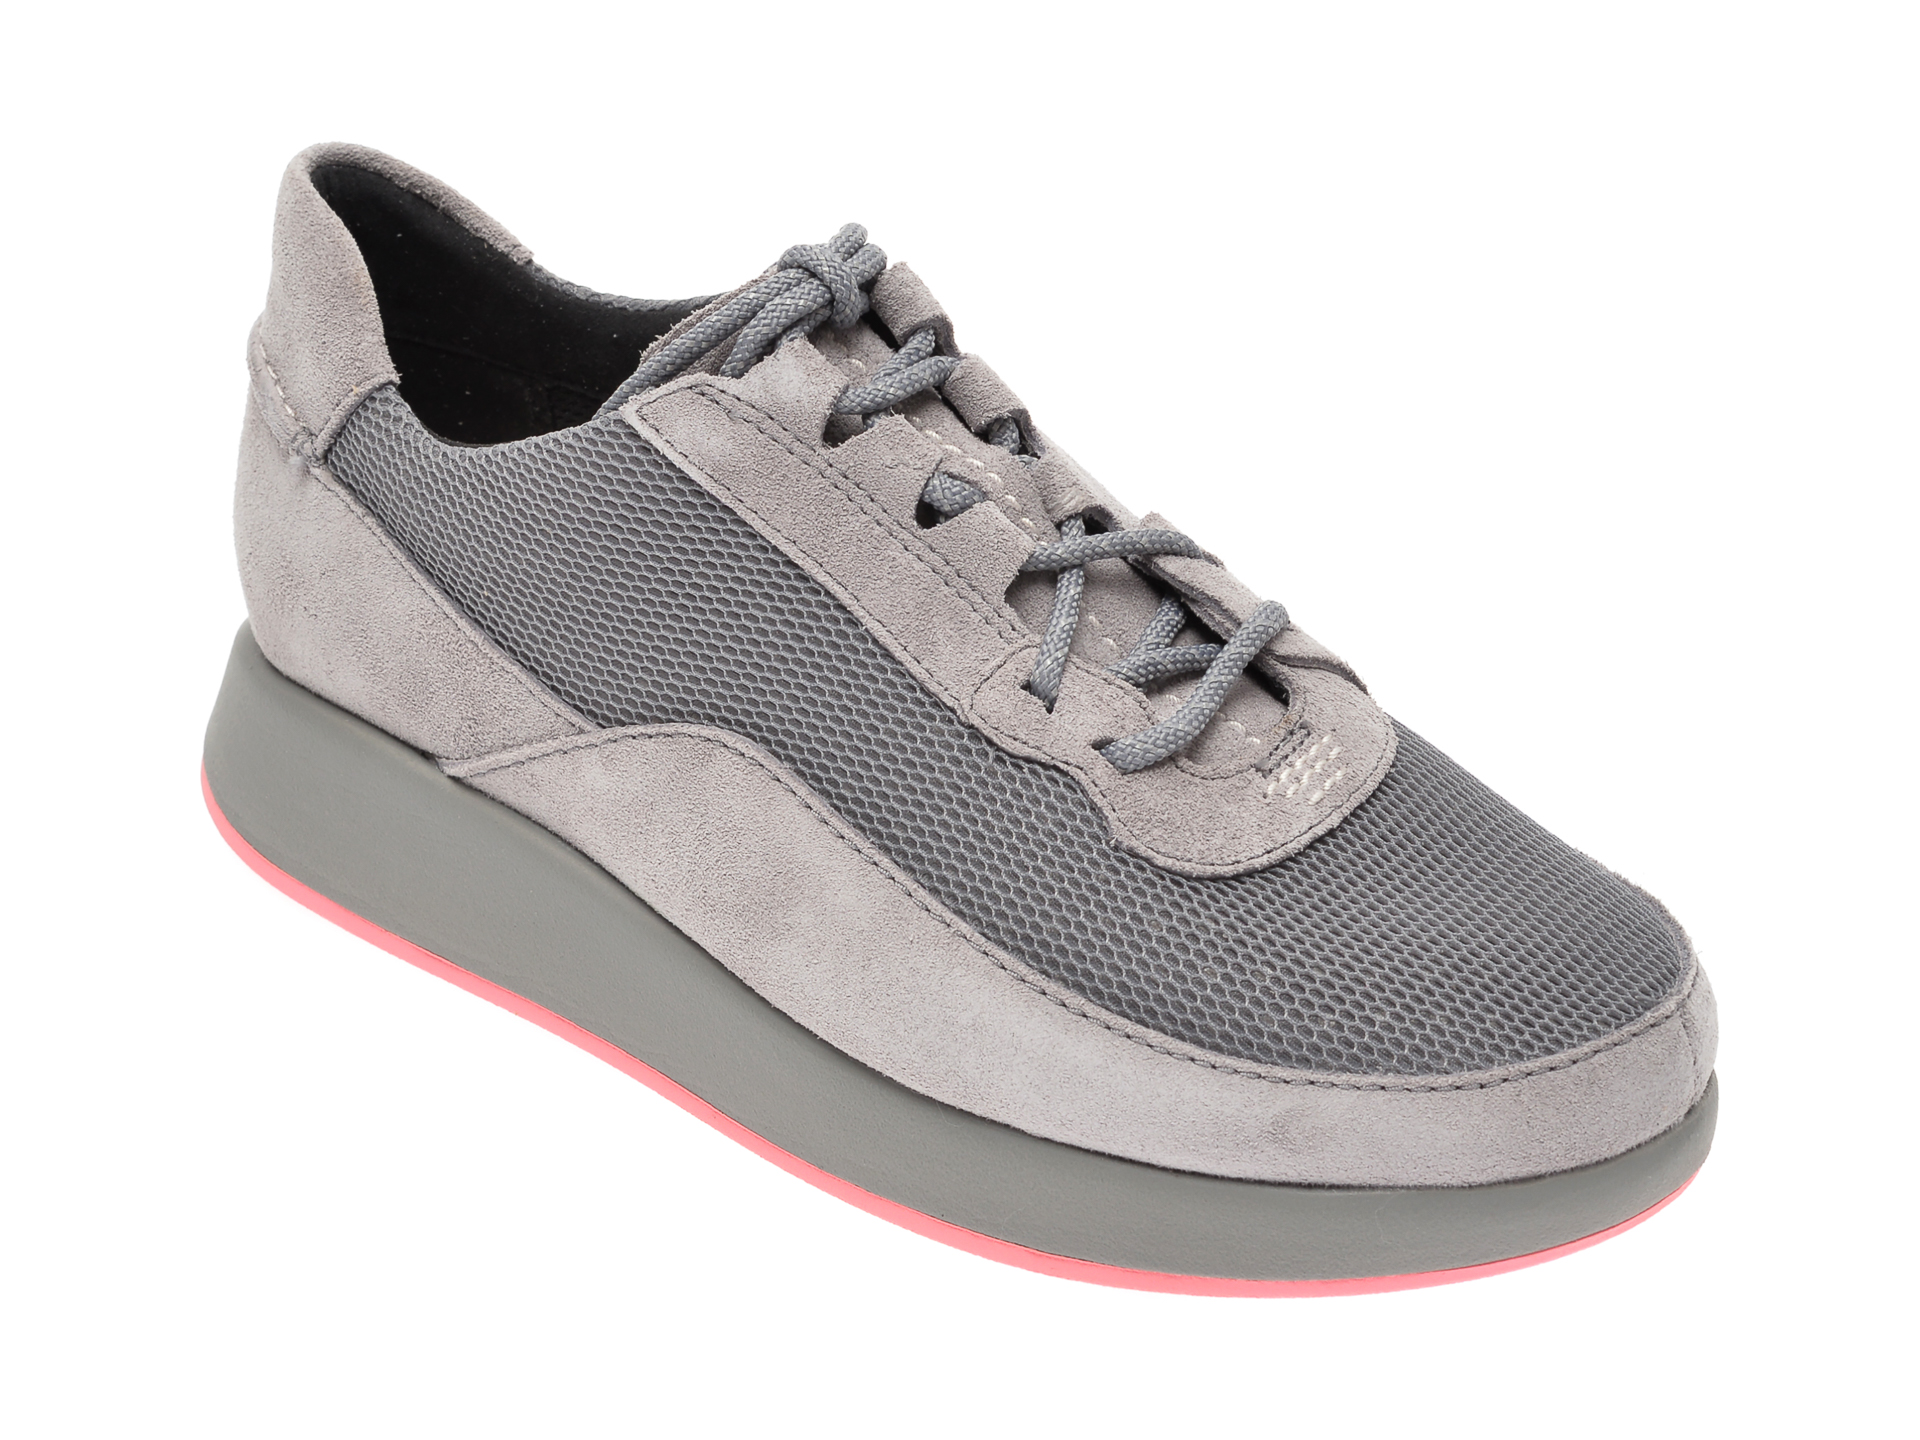 Pantofi sport CLARKS gri, Un Rio Lace, din piele naturala